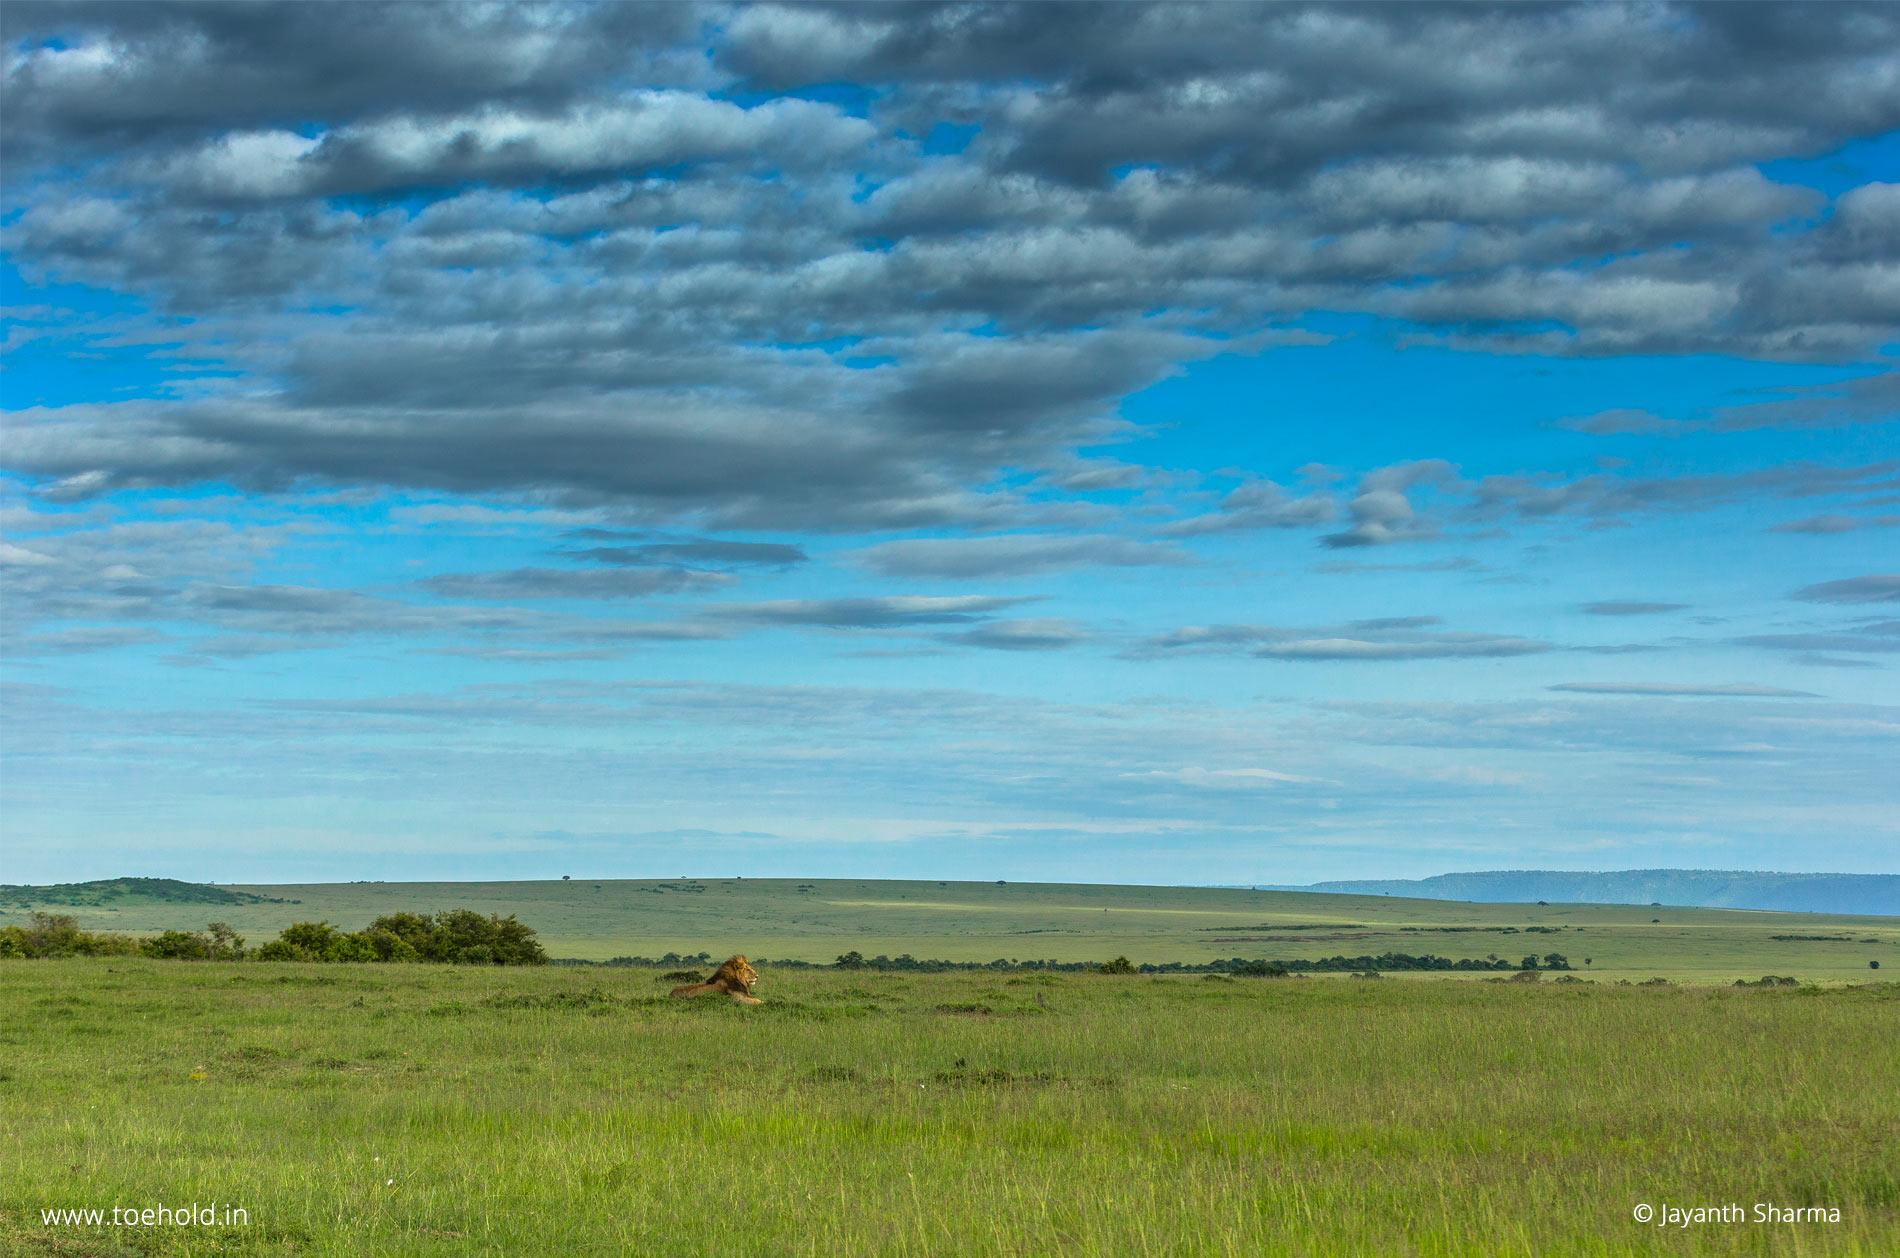 Lion on short green grass, Masai Mara